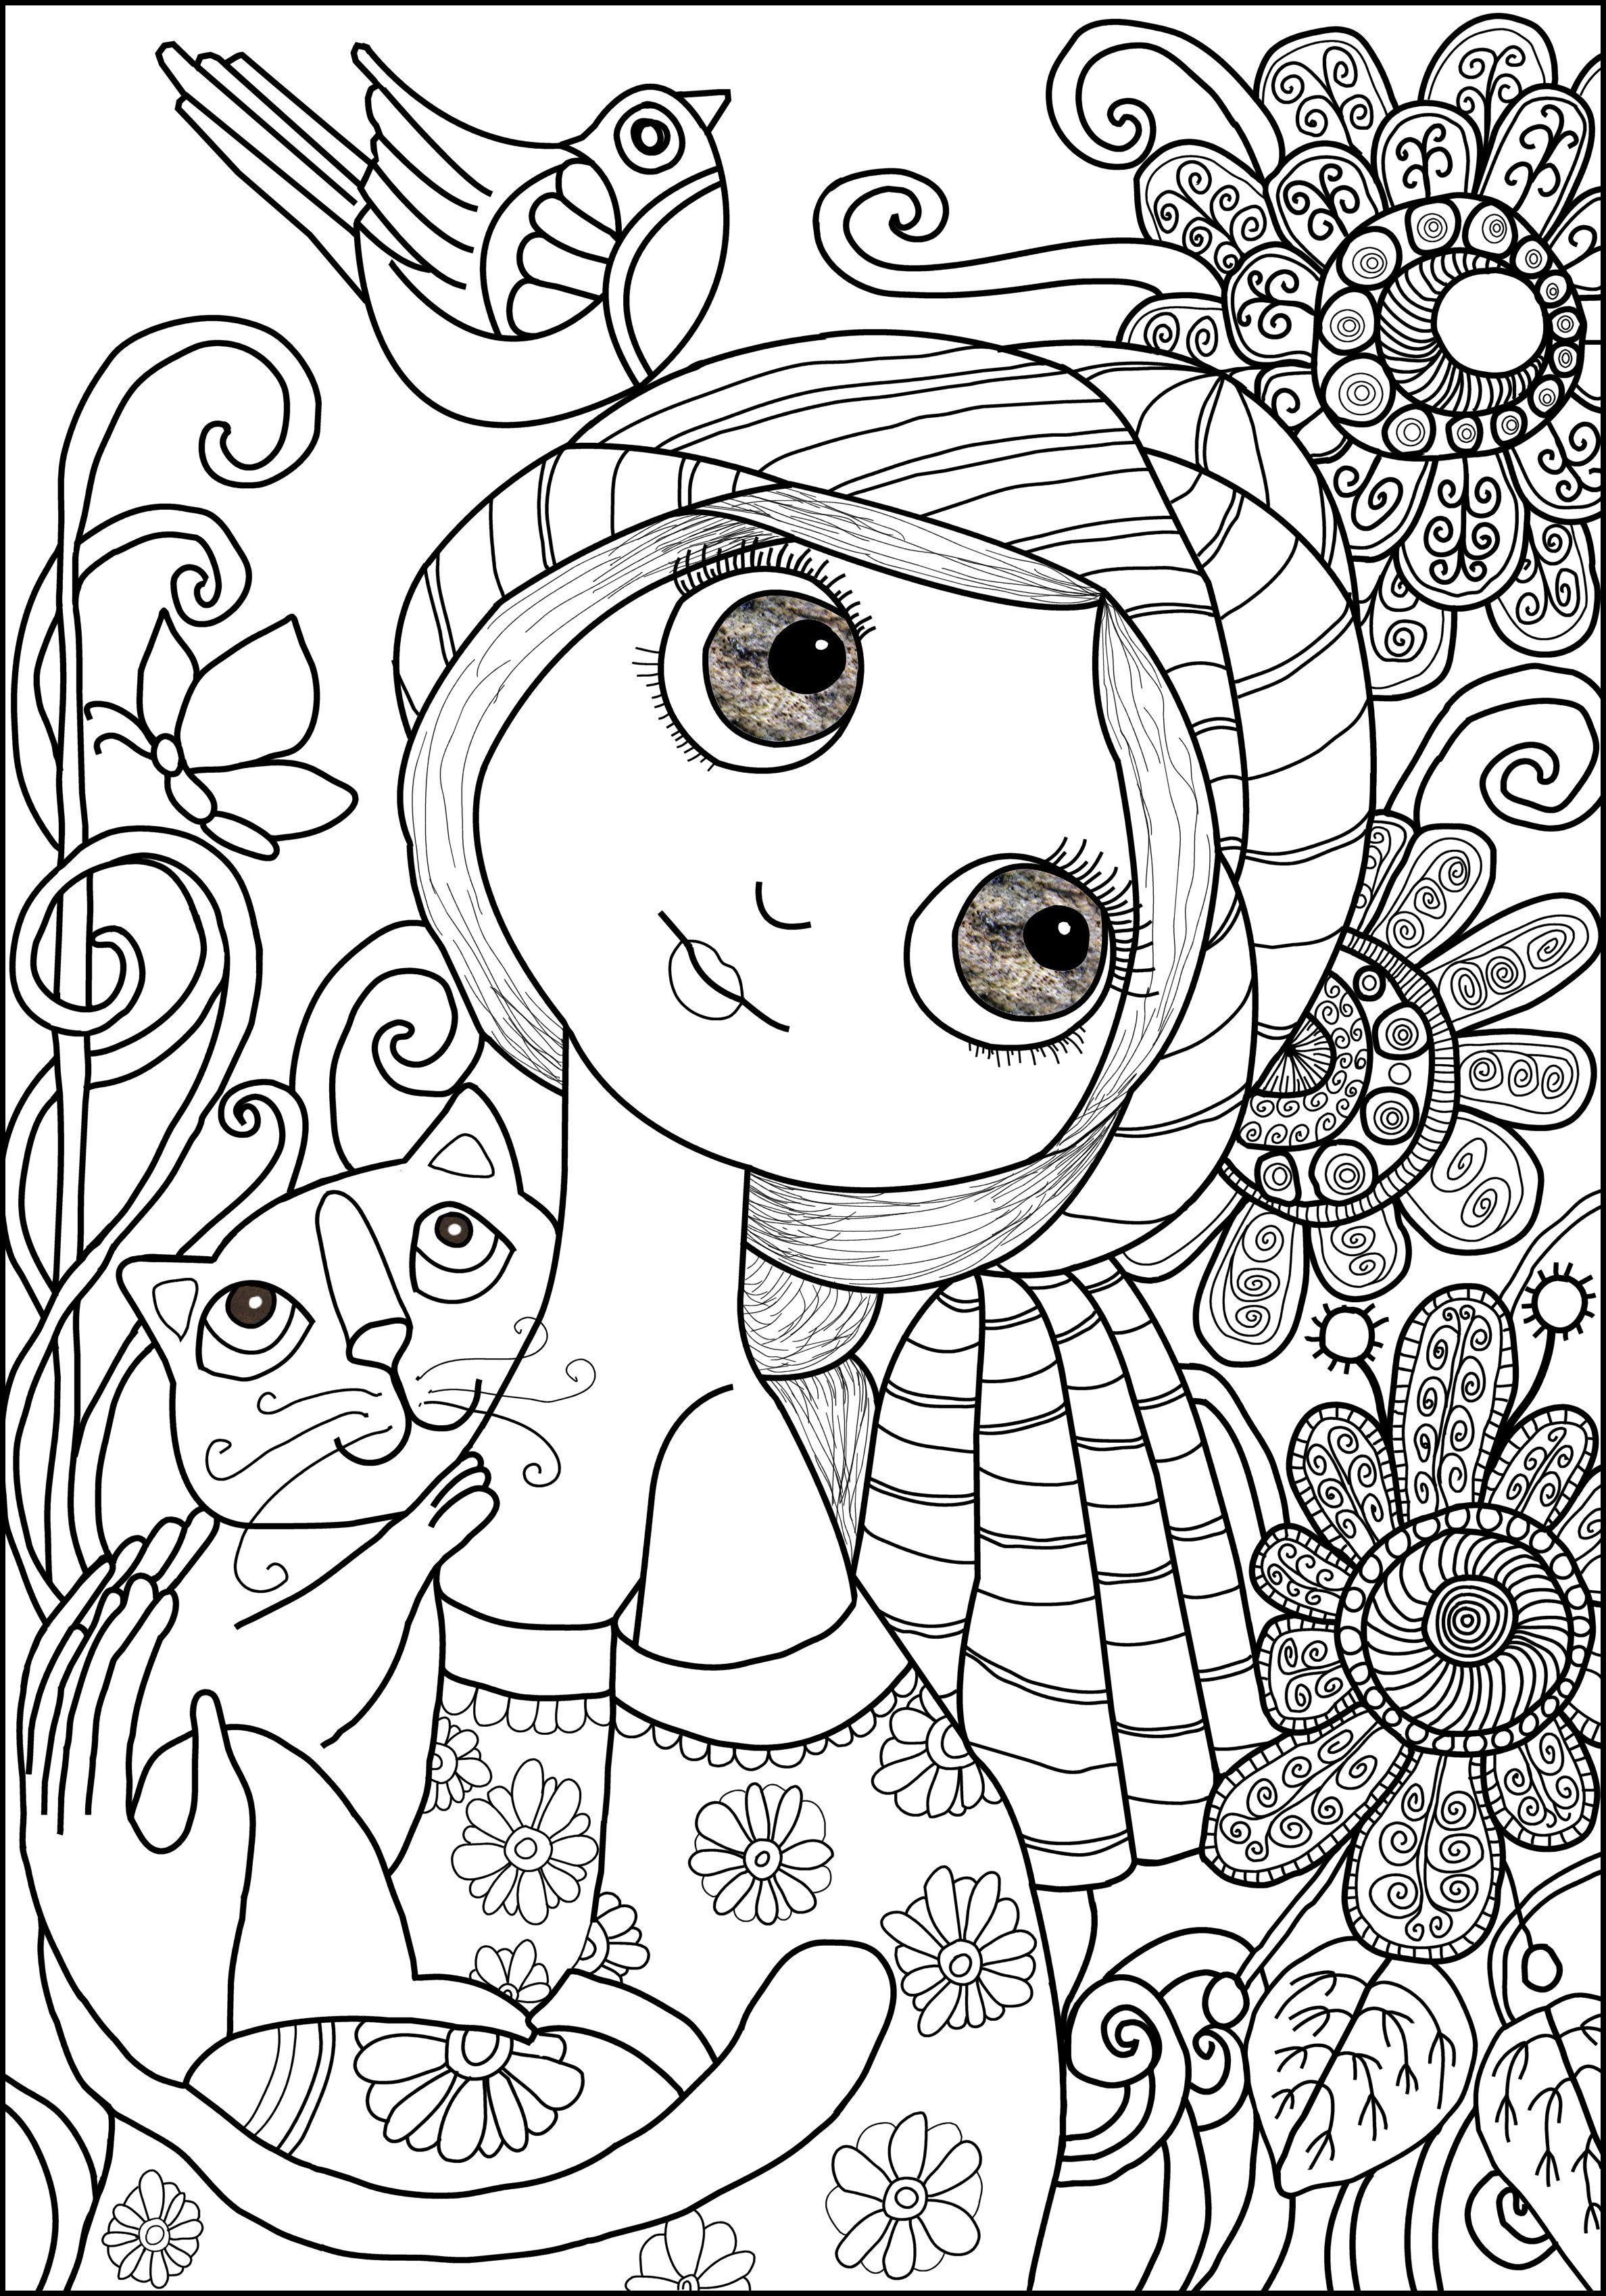 Dessin Desenhos Para Colorir Adultos Arte Abstrata Colorida